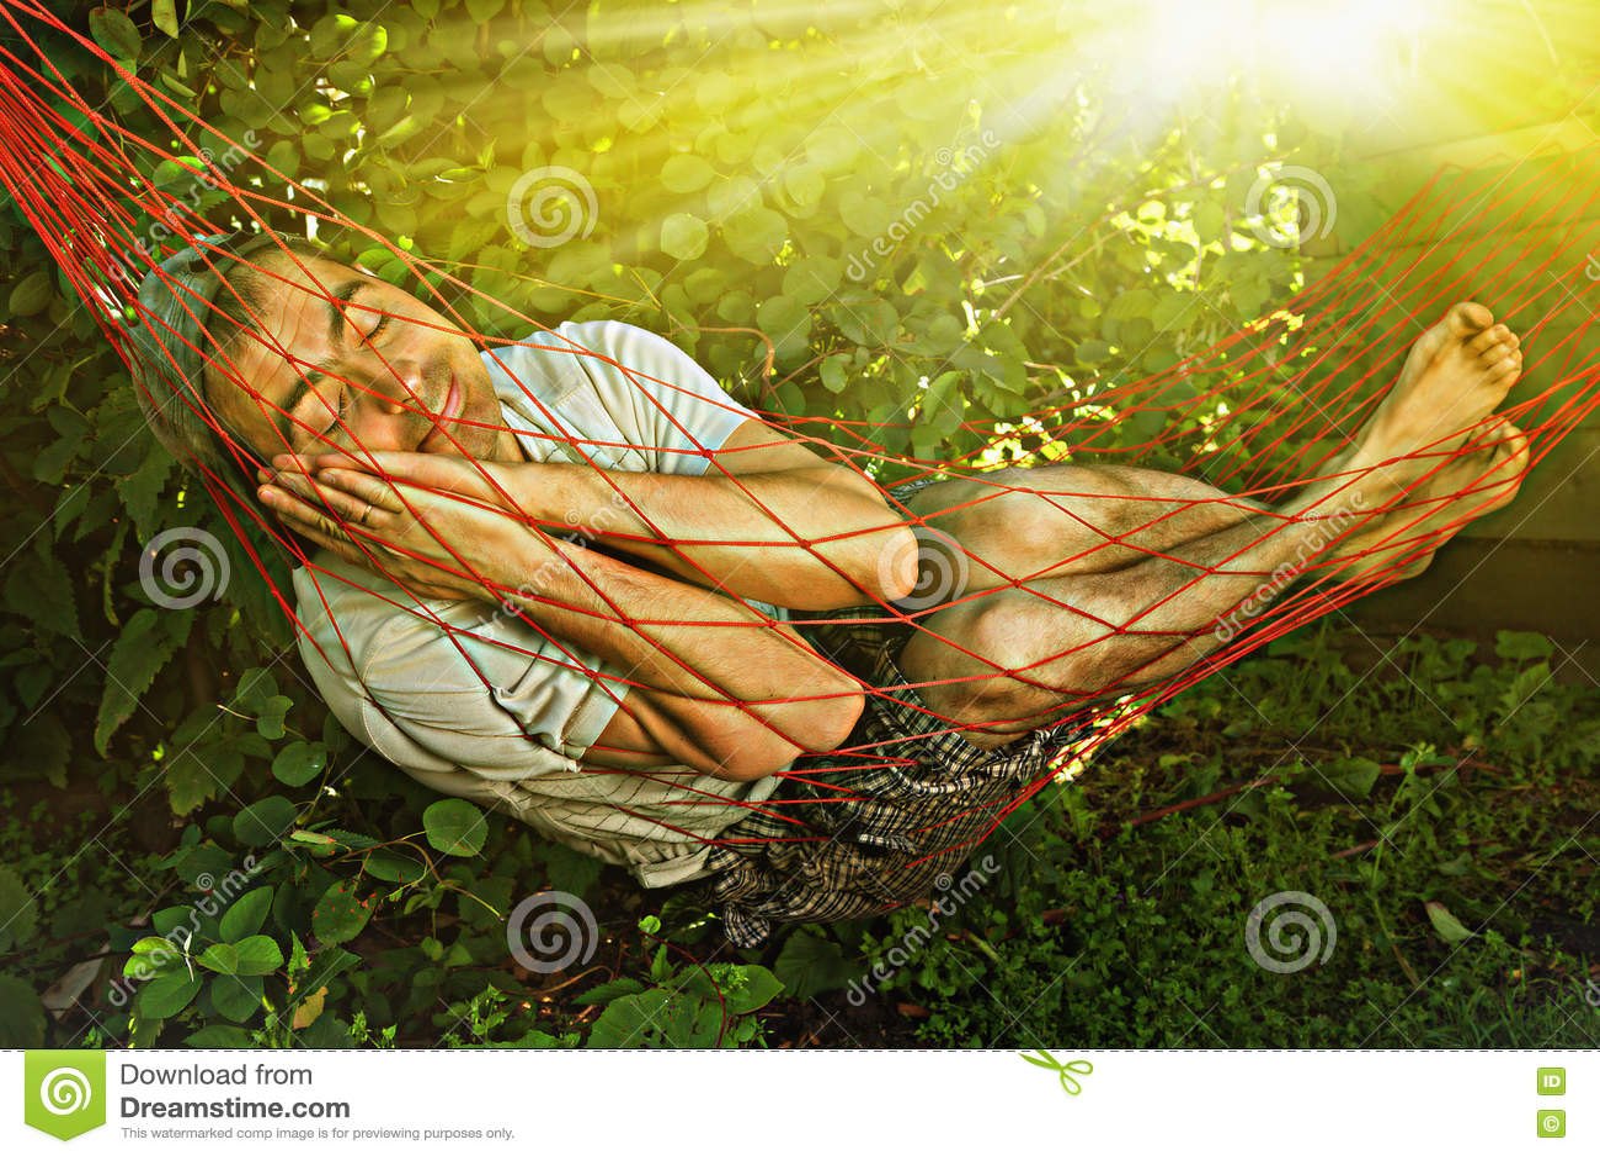 Man Sleeping In Hammock Stock Image Image Of Happy